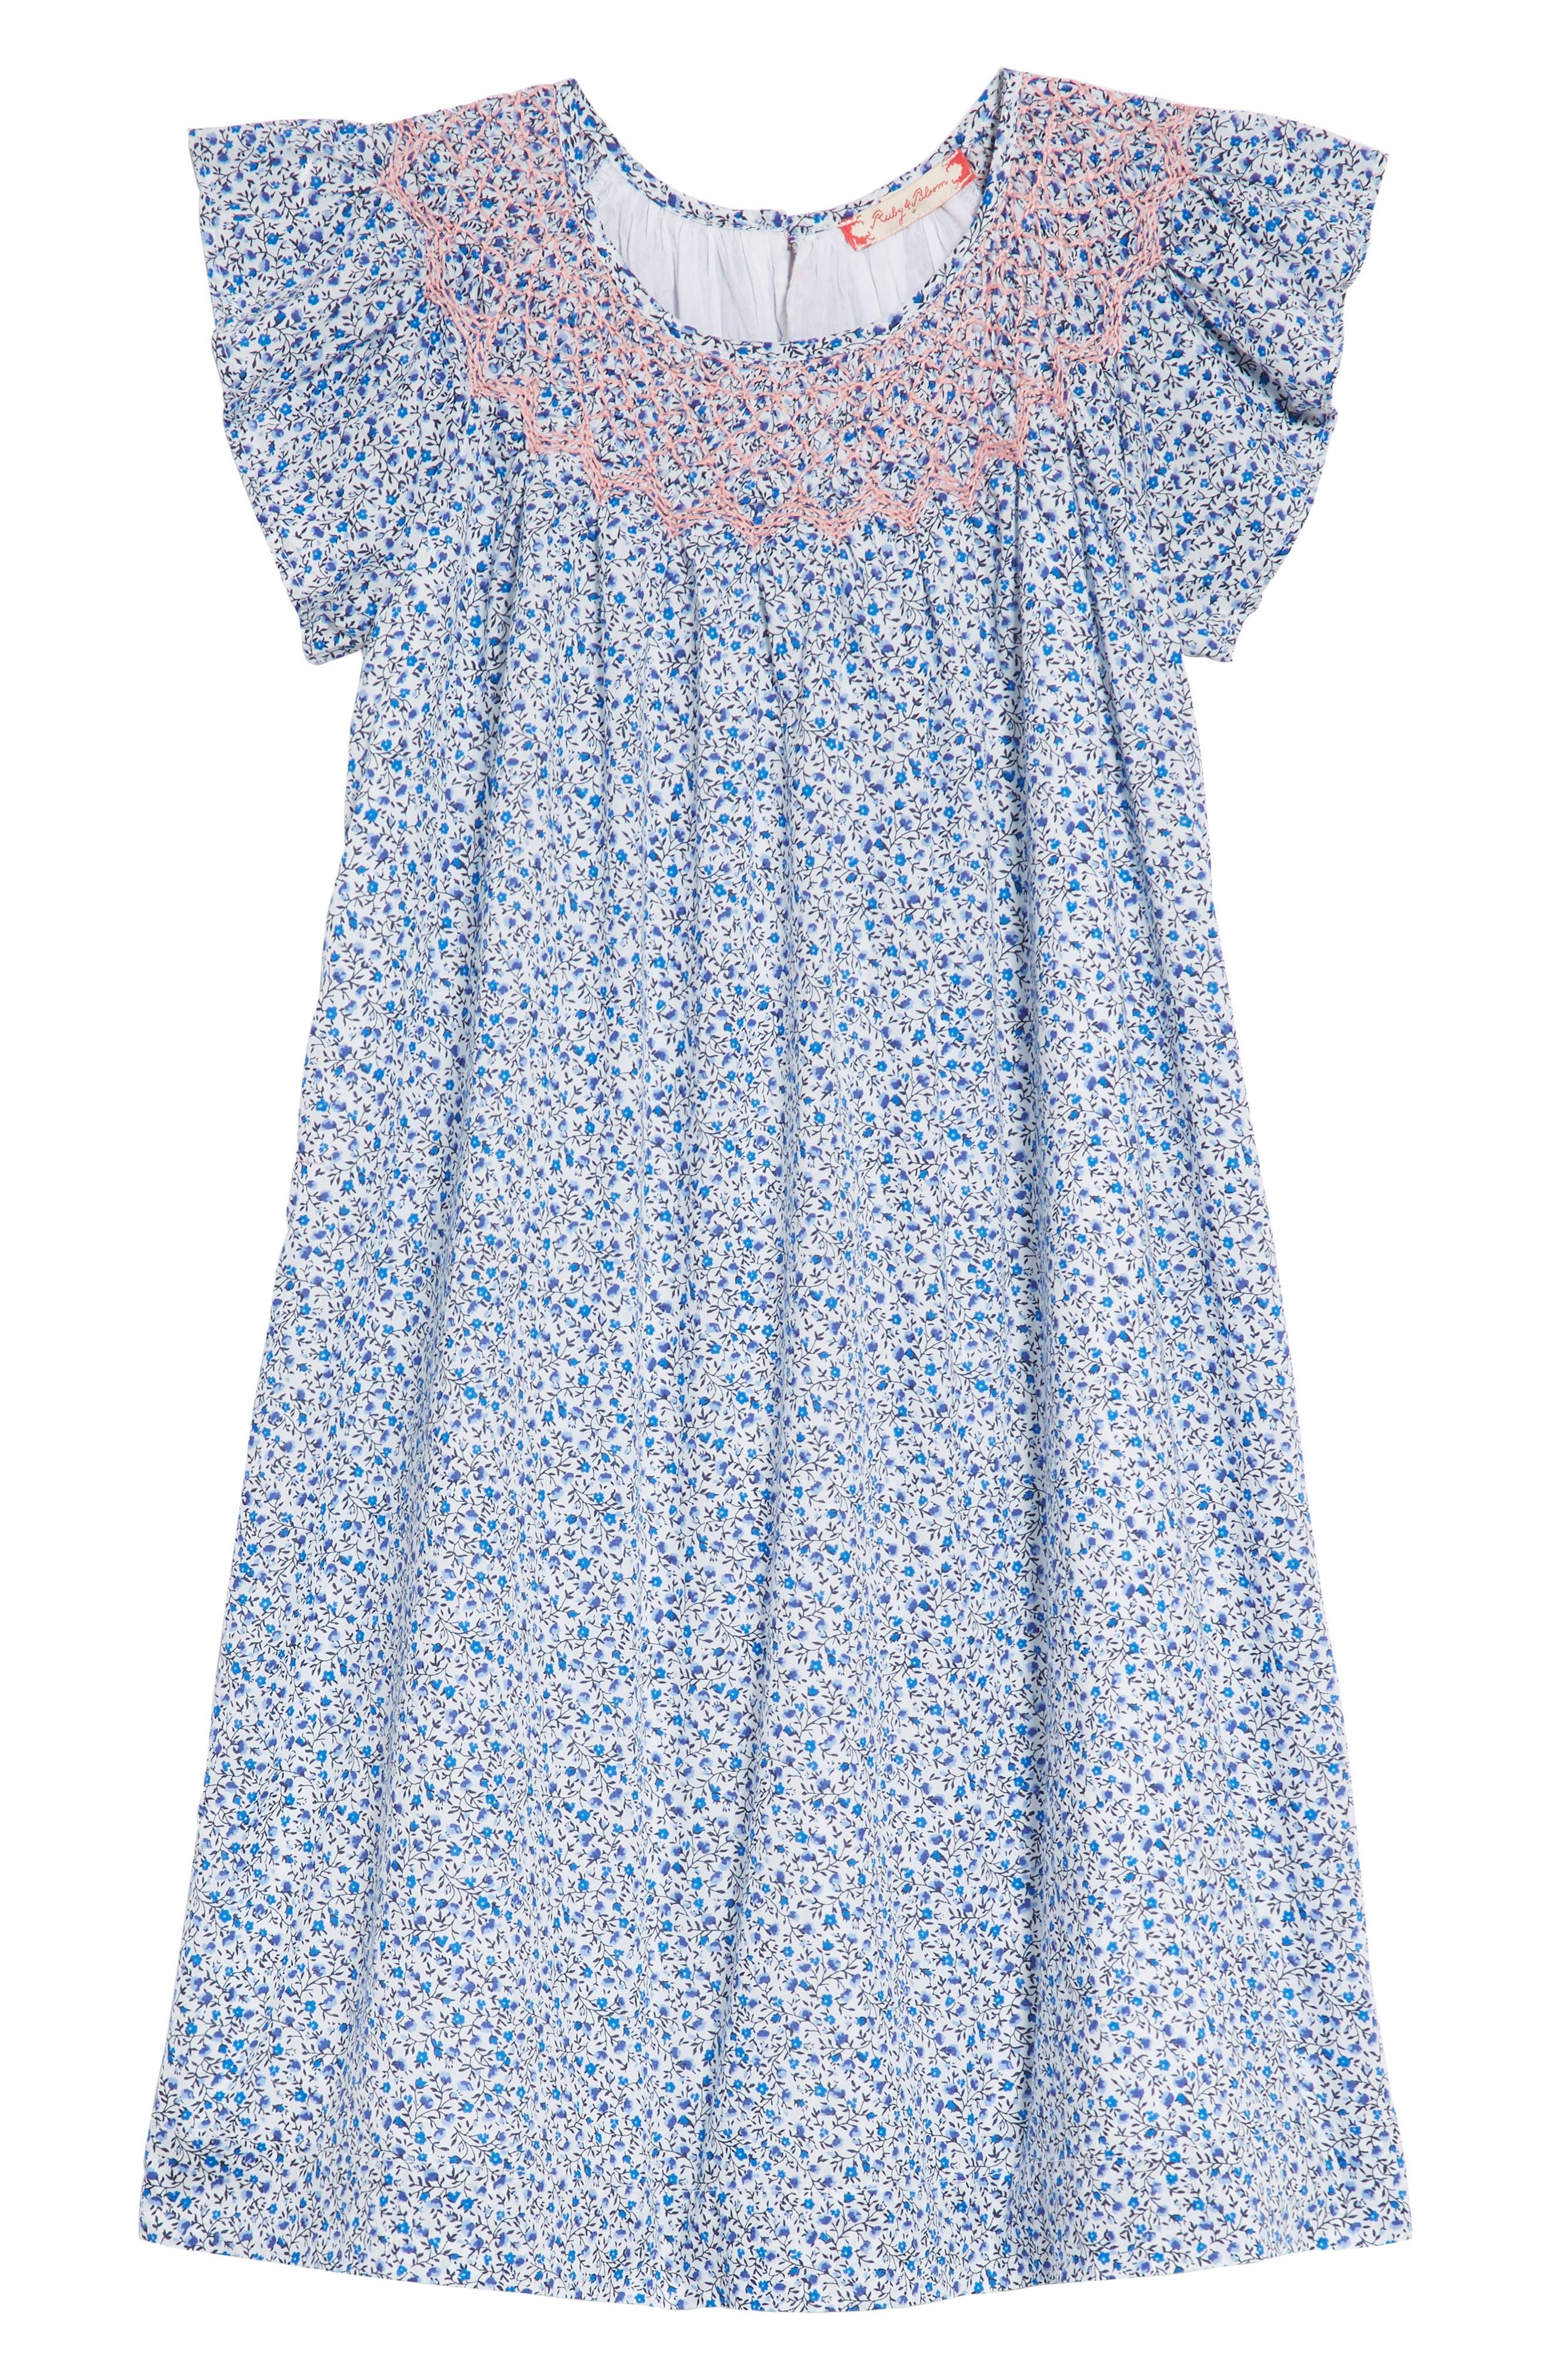 Ruby & Bloom Smocked Ditzy Dress (Toddler Girls, Little Girls & Big Girls)